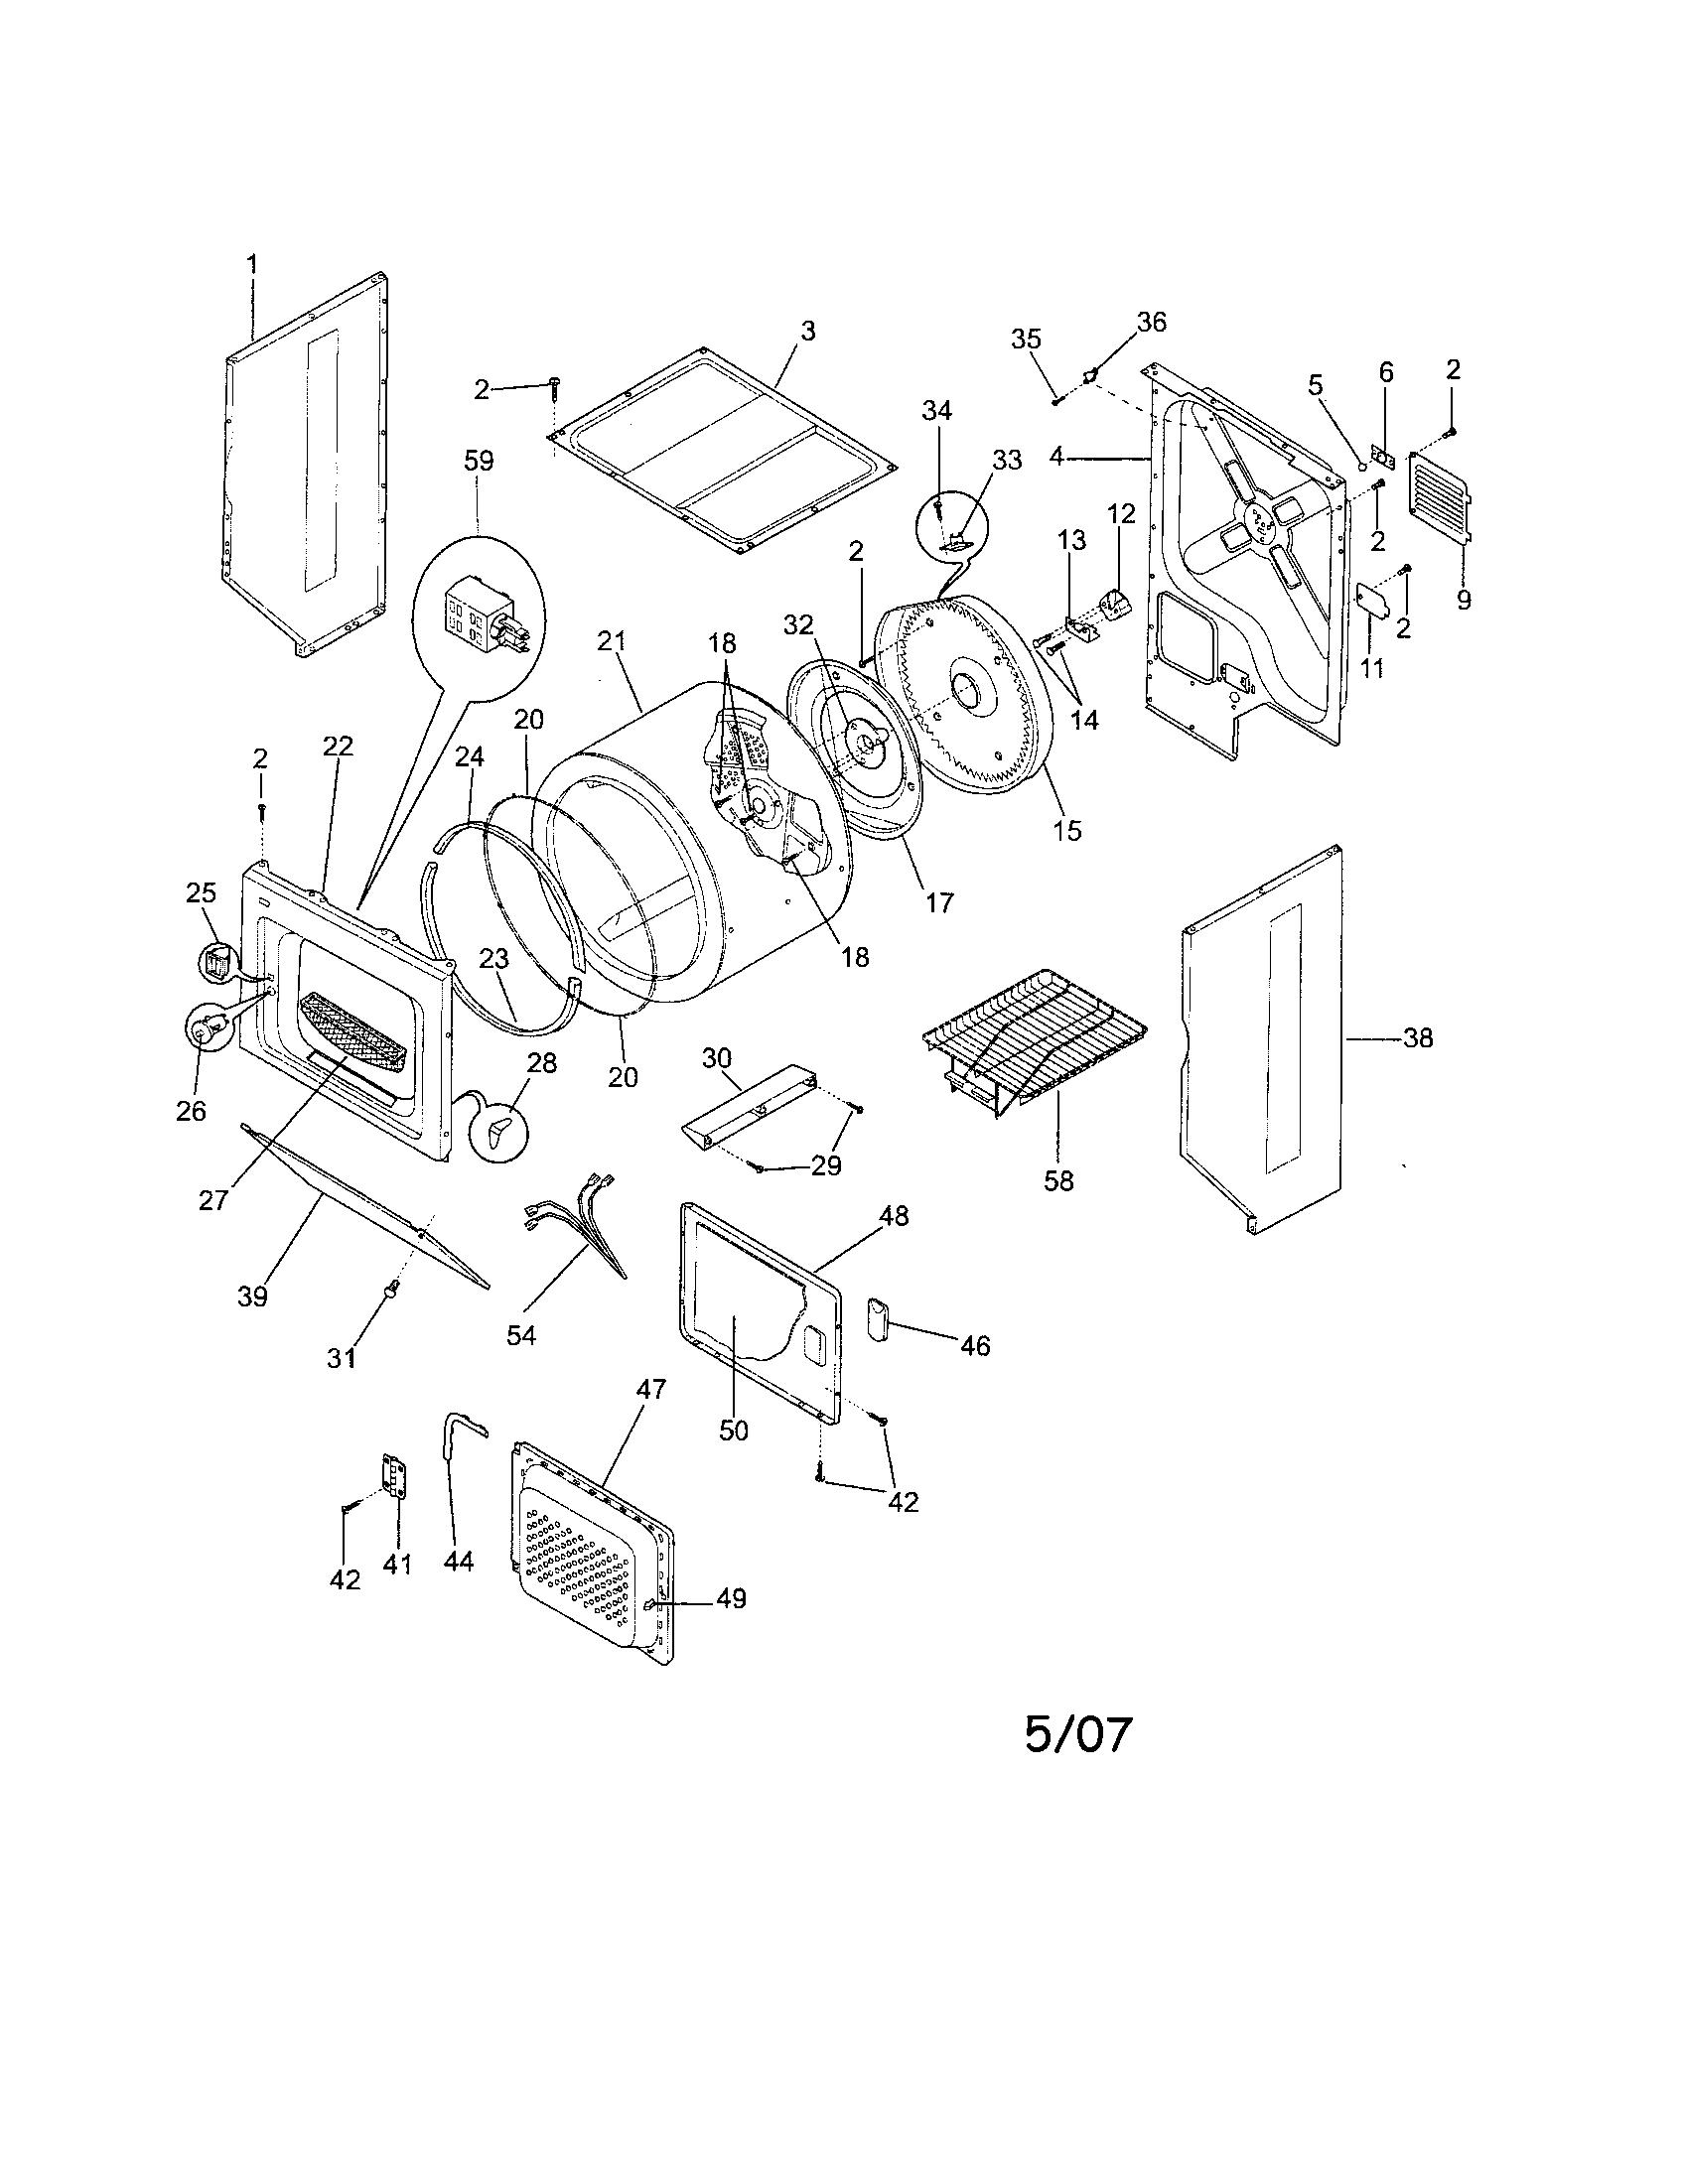 Frigidaire Affinity Dryer Fuse Location Whirlpool Dryer